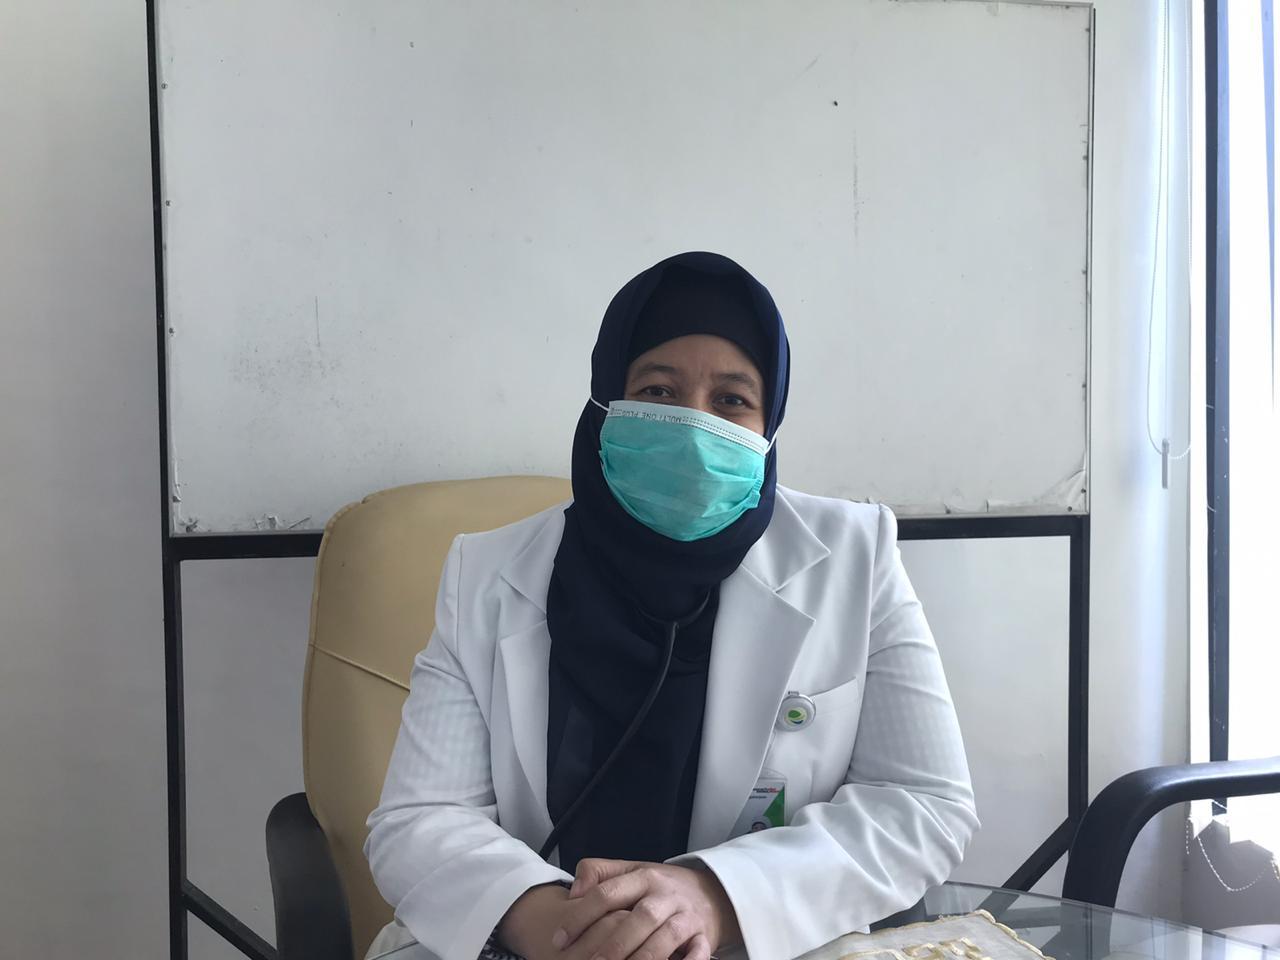 Menarik Harpelnas 2020 Bp Jamsostek Cabang Padang Konsep Pelayanan Ala Rumah Sakit Dan Sediakan Suvenir Minangsatu Com